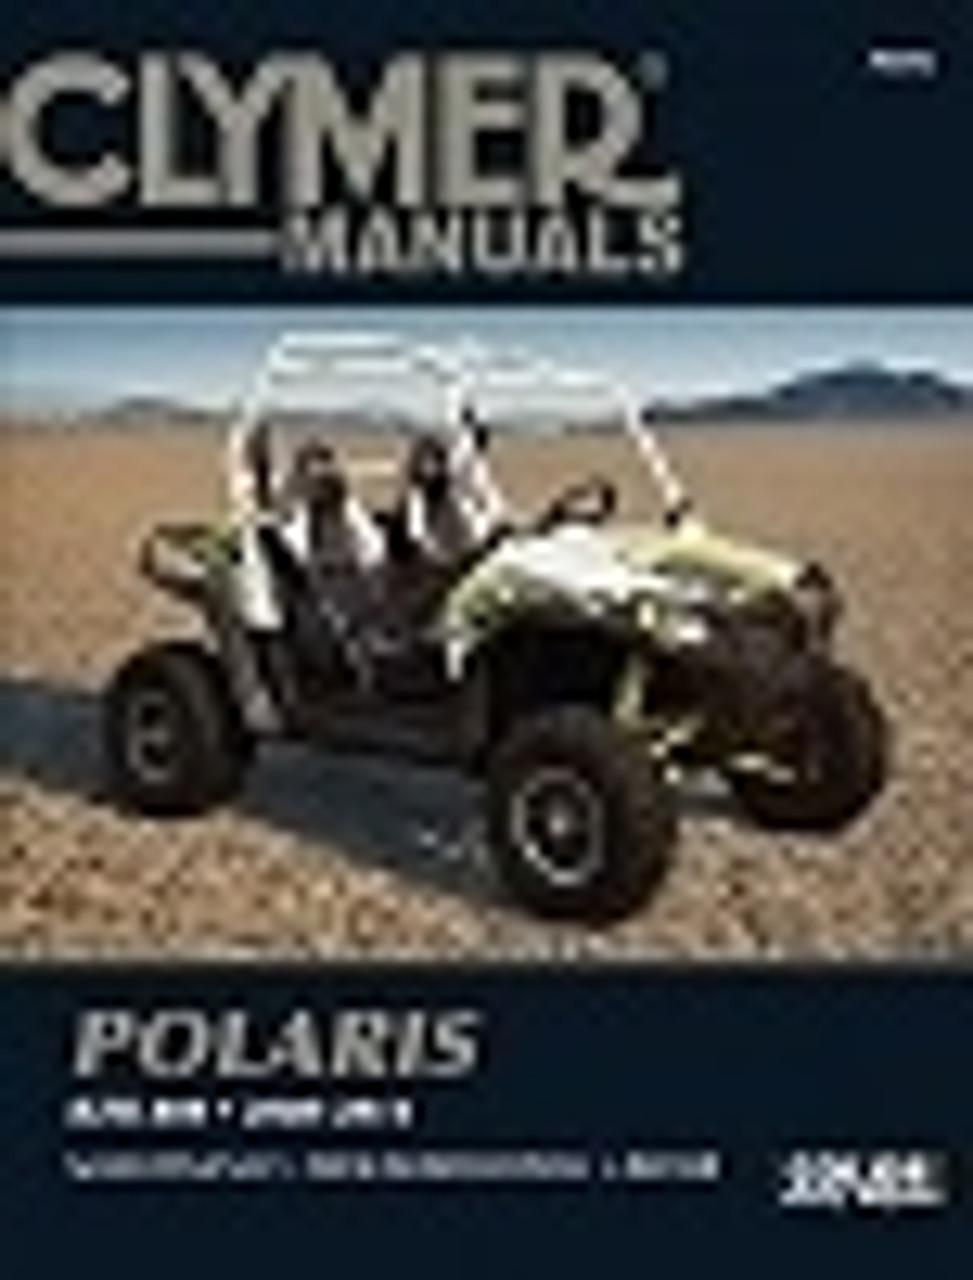 CLYMER SERVICE MANUALS